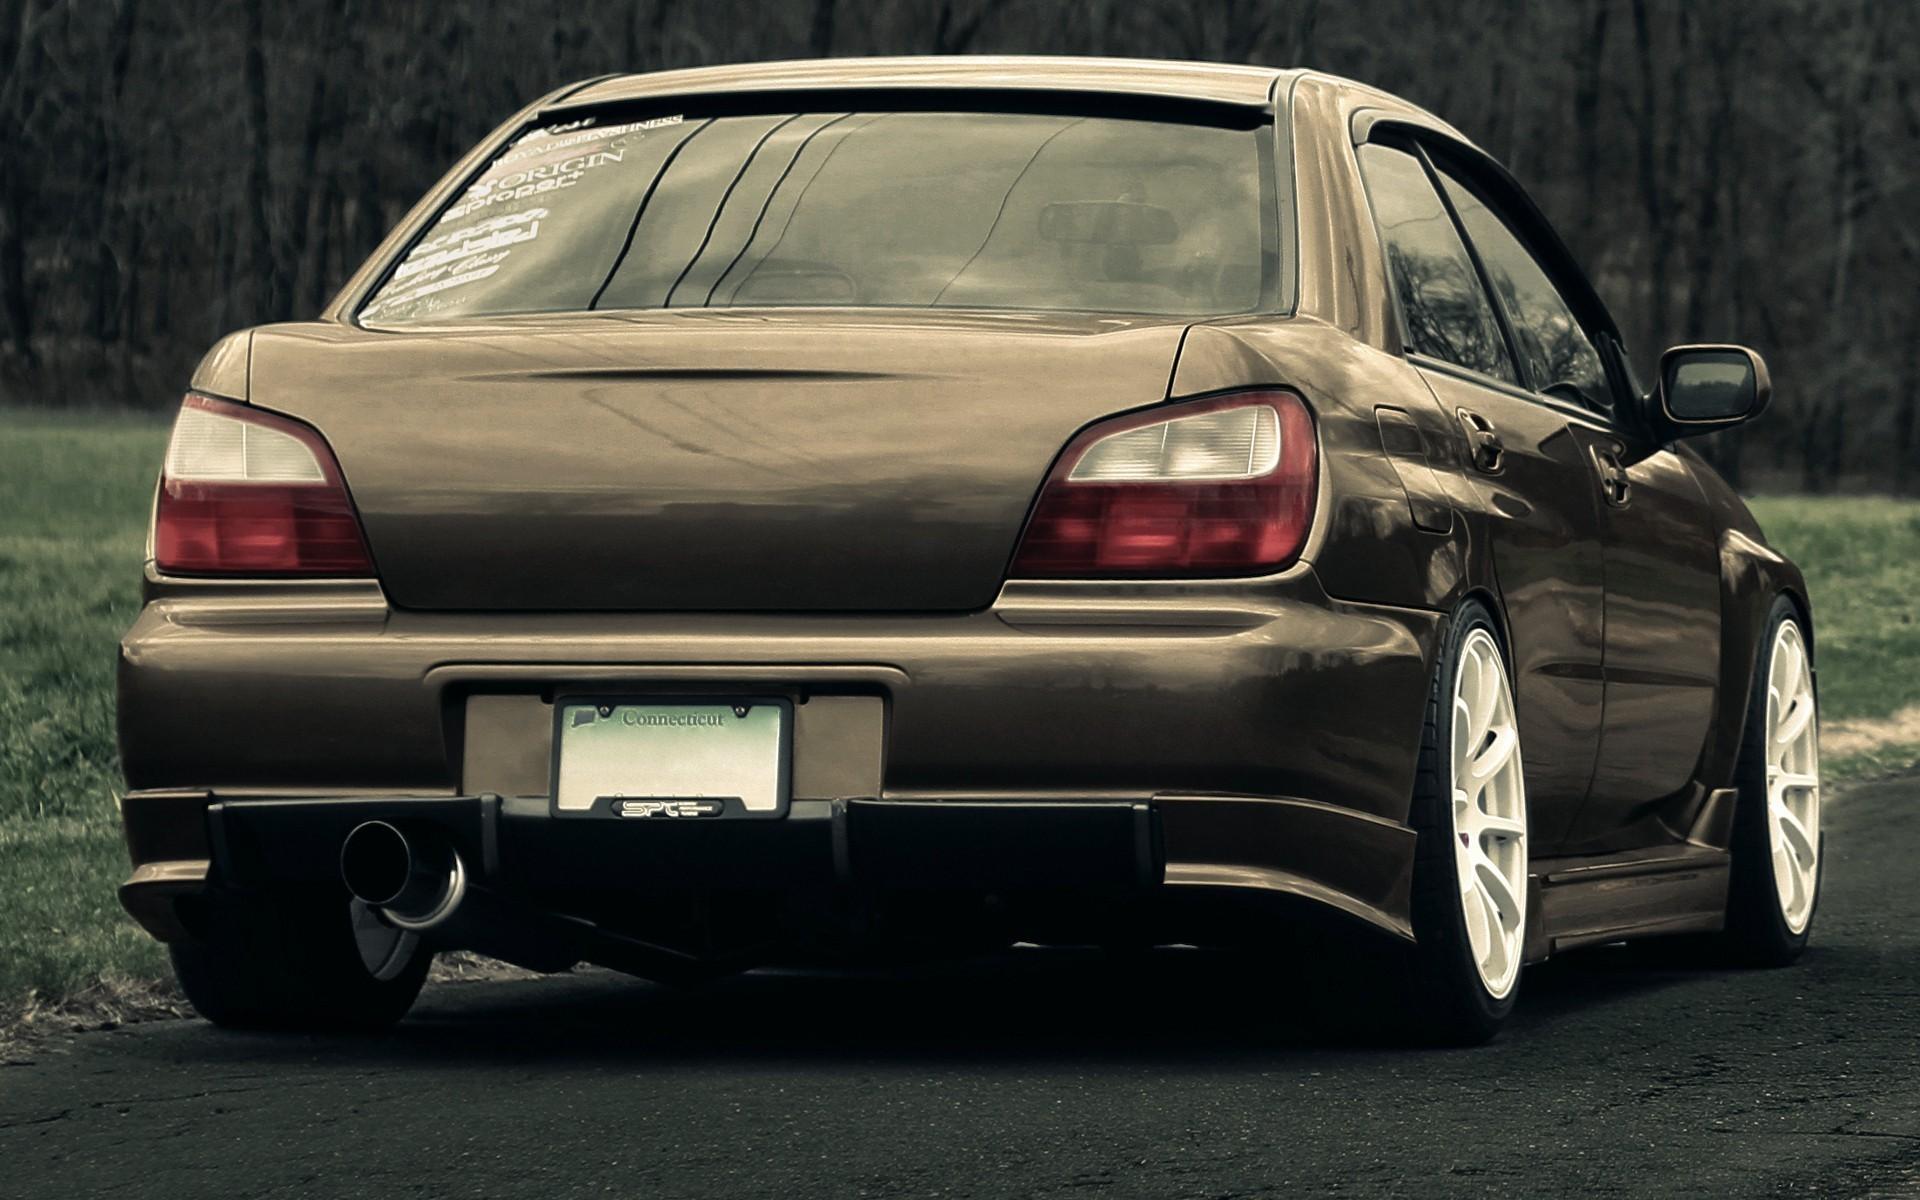 Res: 1920x1200, Japanese domestic market subaru wrx cars stance wallpaper